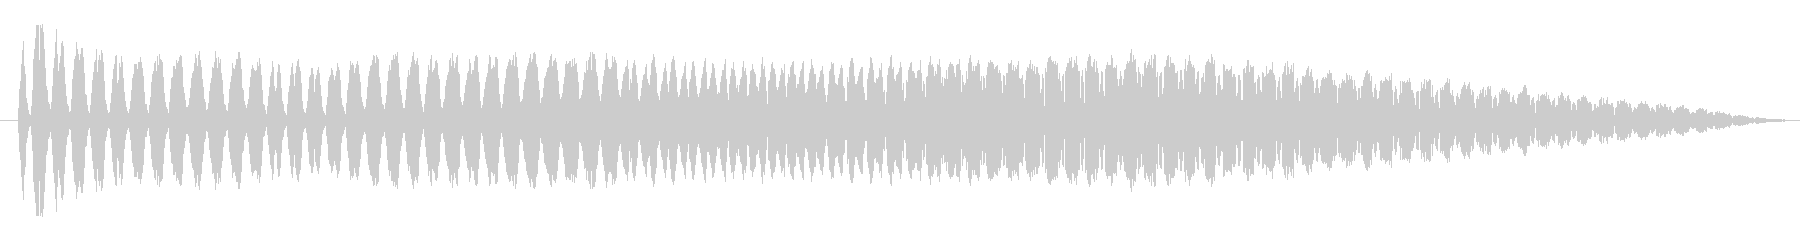 FX バブルチャージ02の未再生の波形